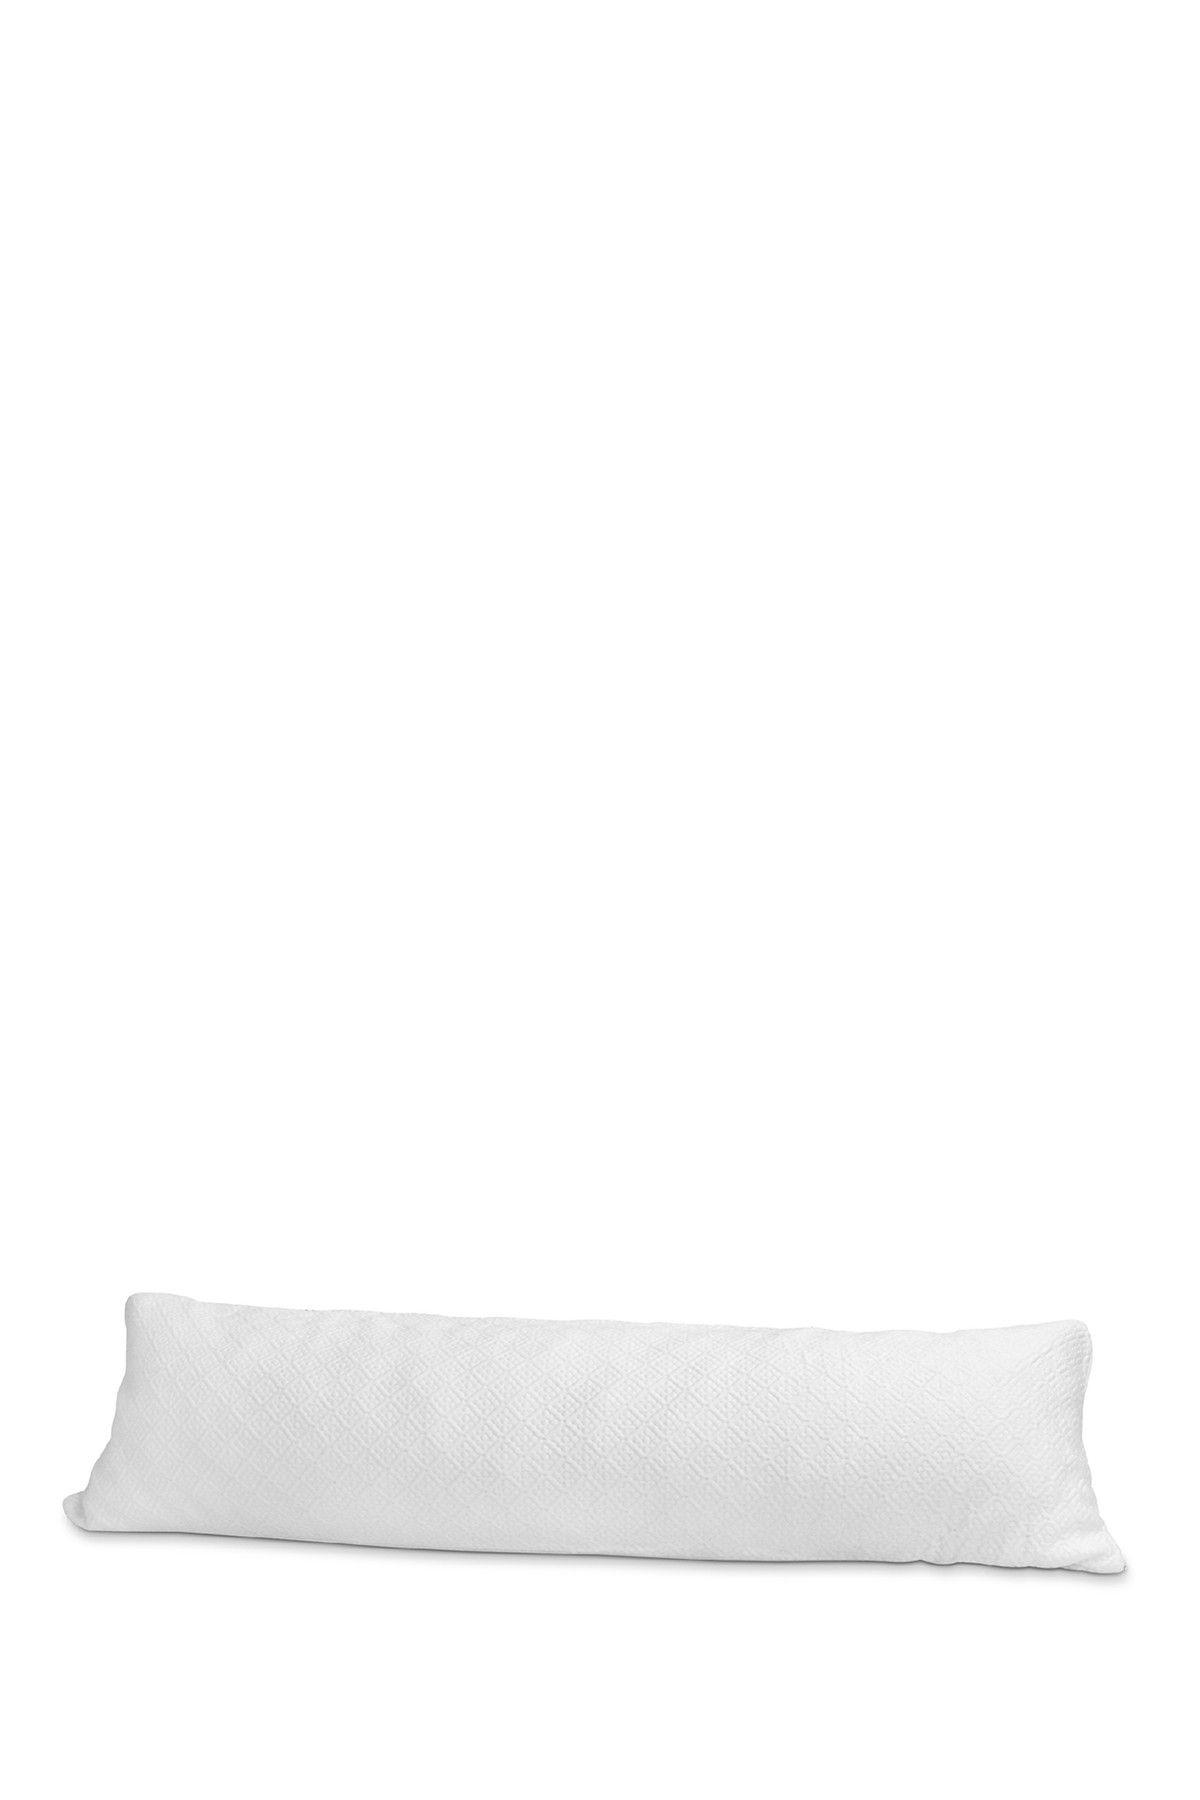 Rio Home Pure Rest Memory Foam Body Pillow White Memory Foam Body Pillow White Pillows Bed Pillows